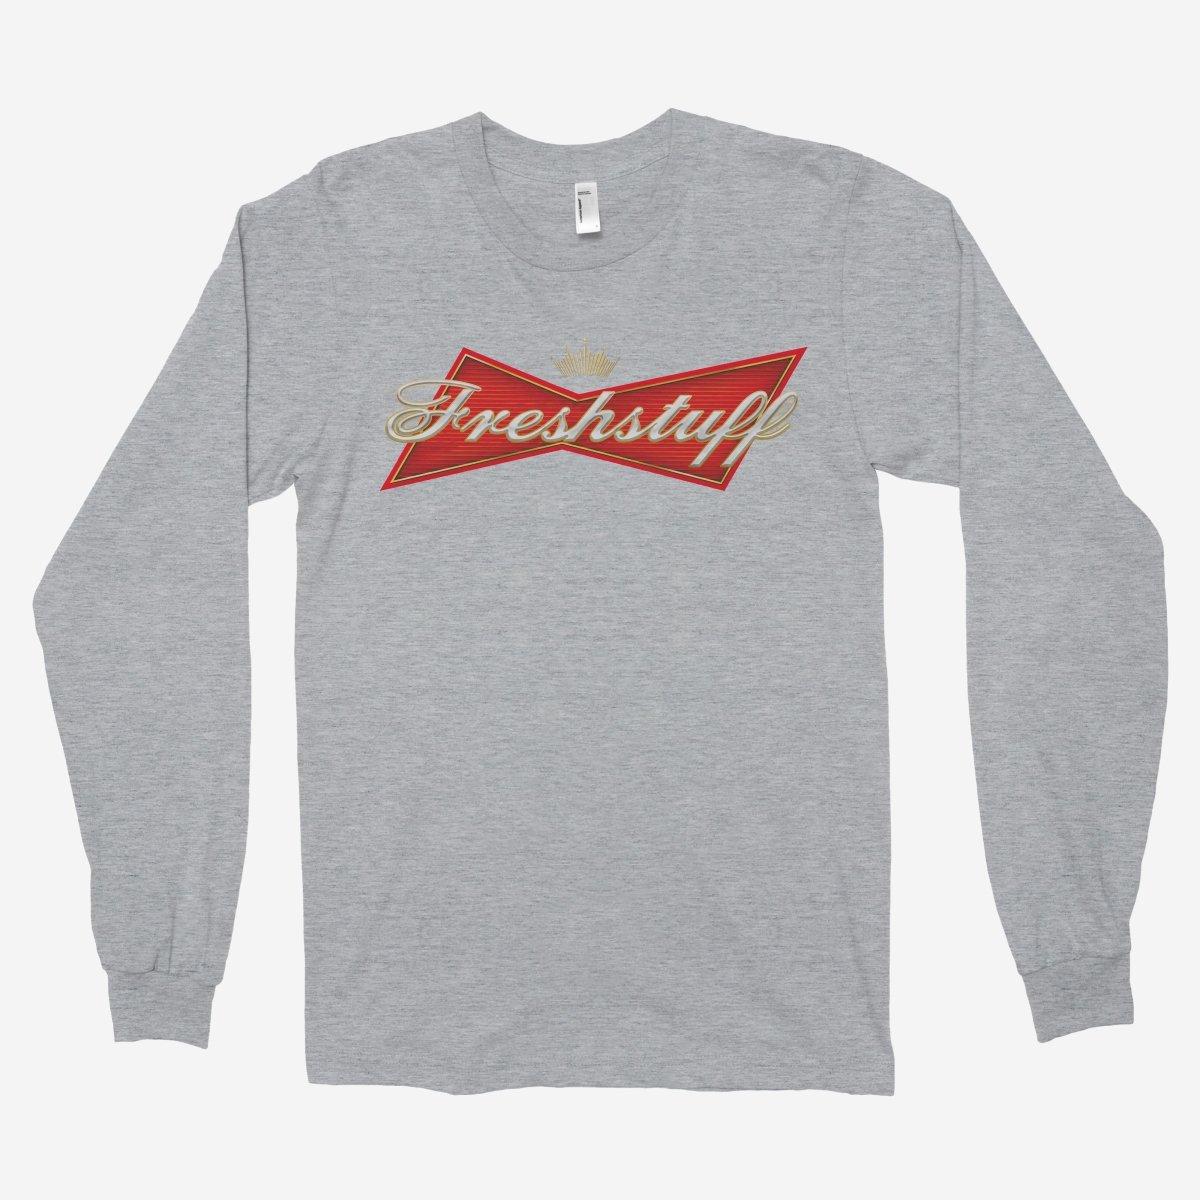 FreshStuff (American Beer Logo) Unisex Long Sleeve T-Shirt